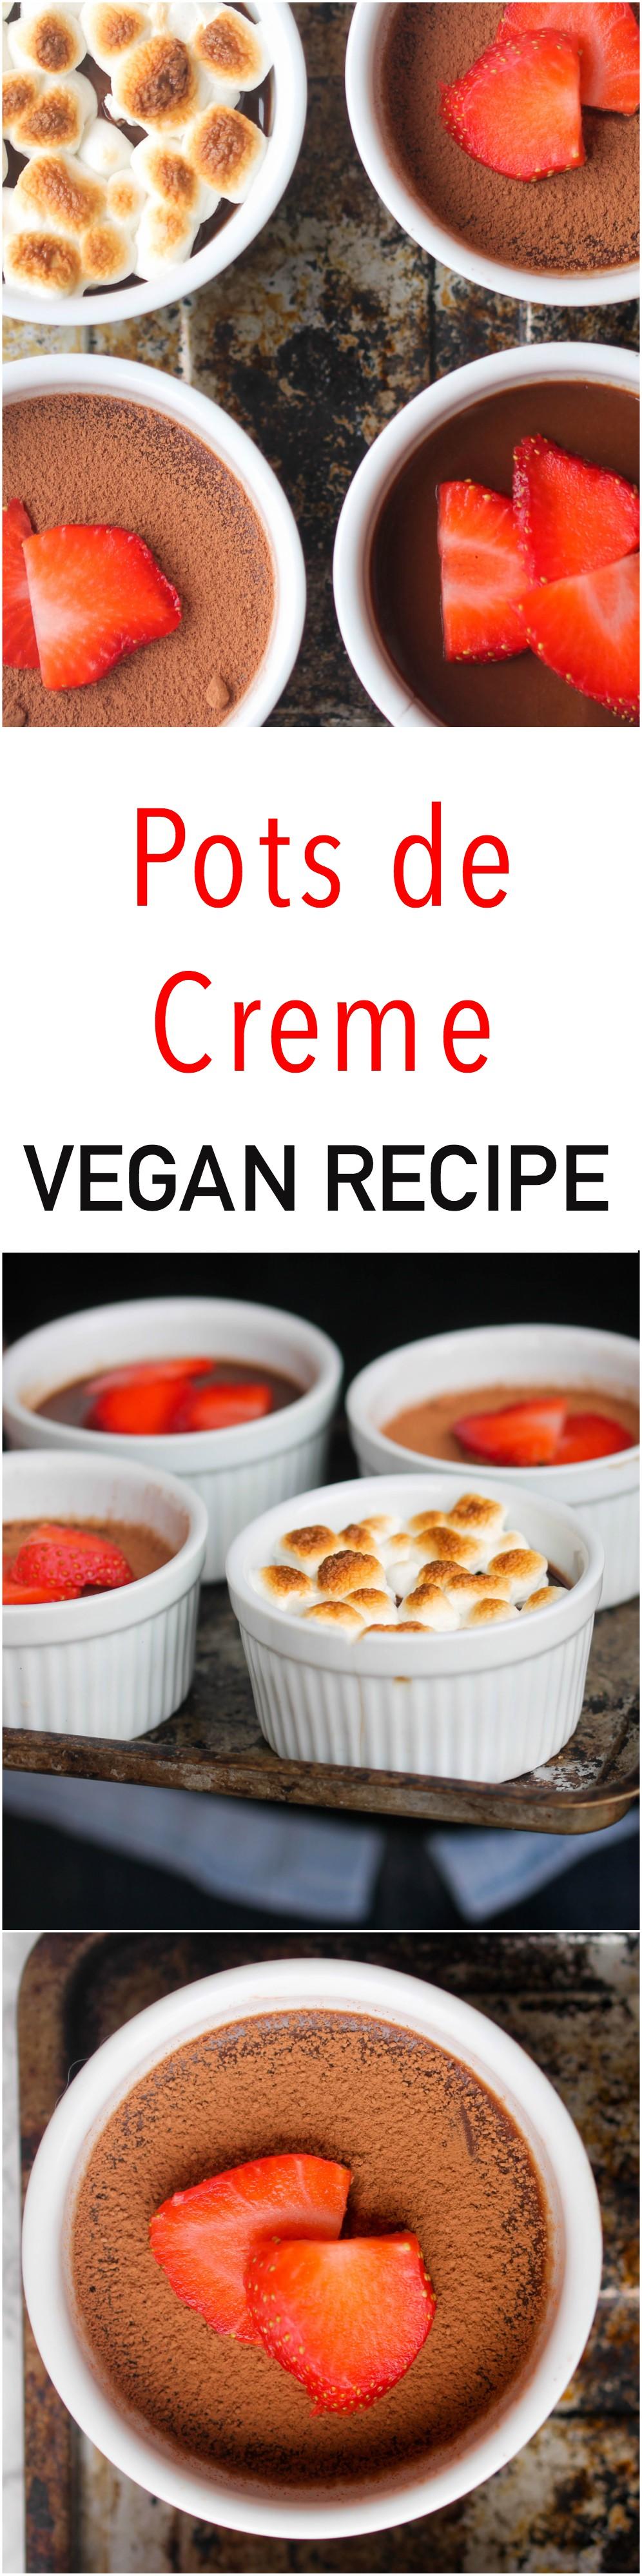 Vegan, No Bake Pots de Creme